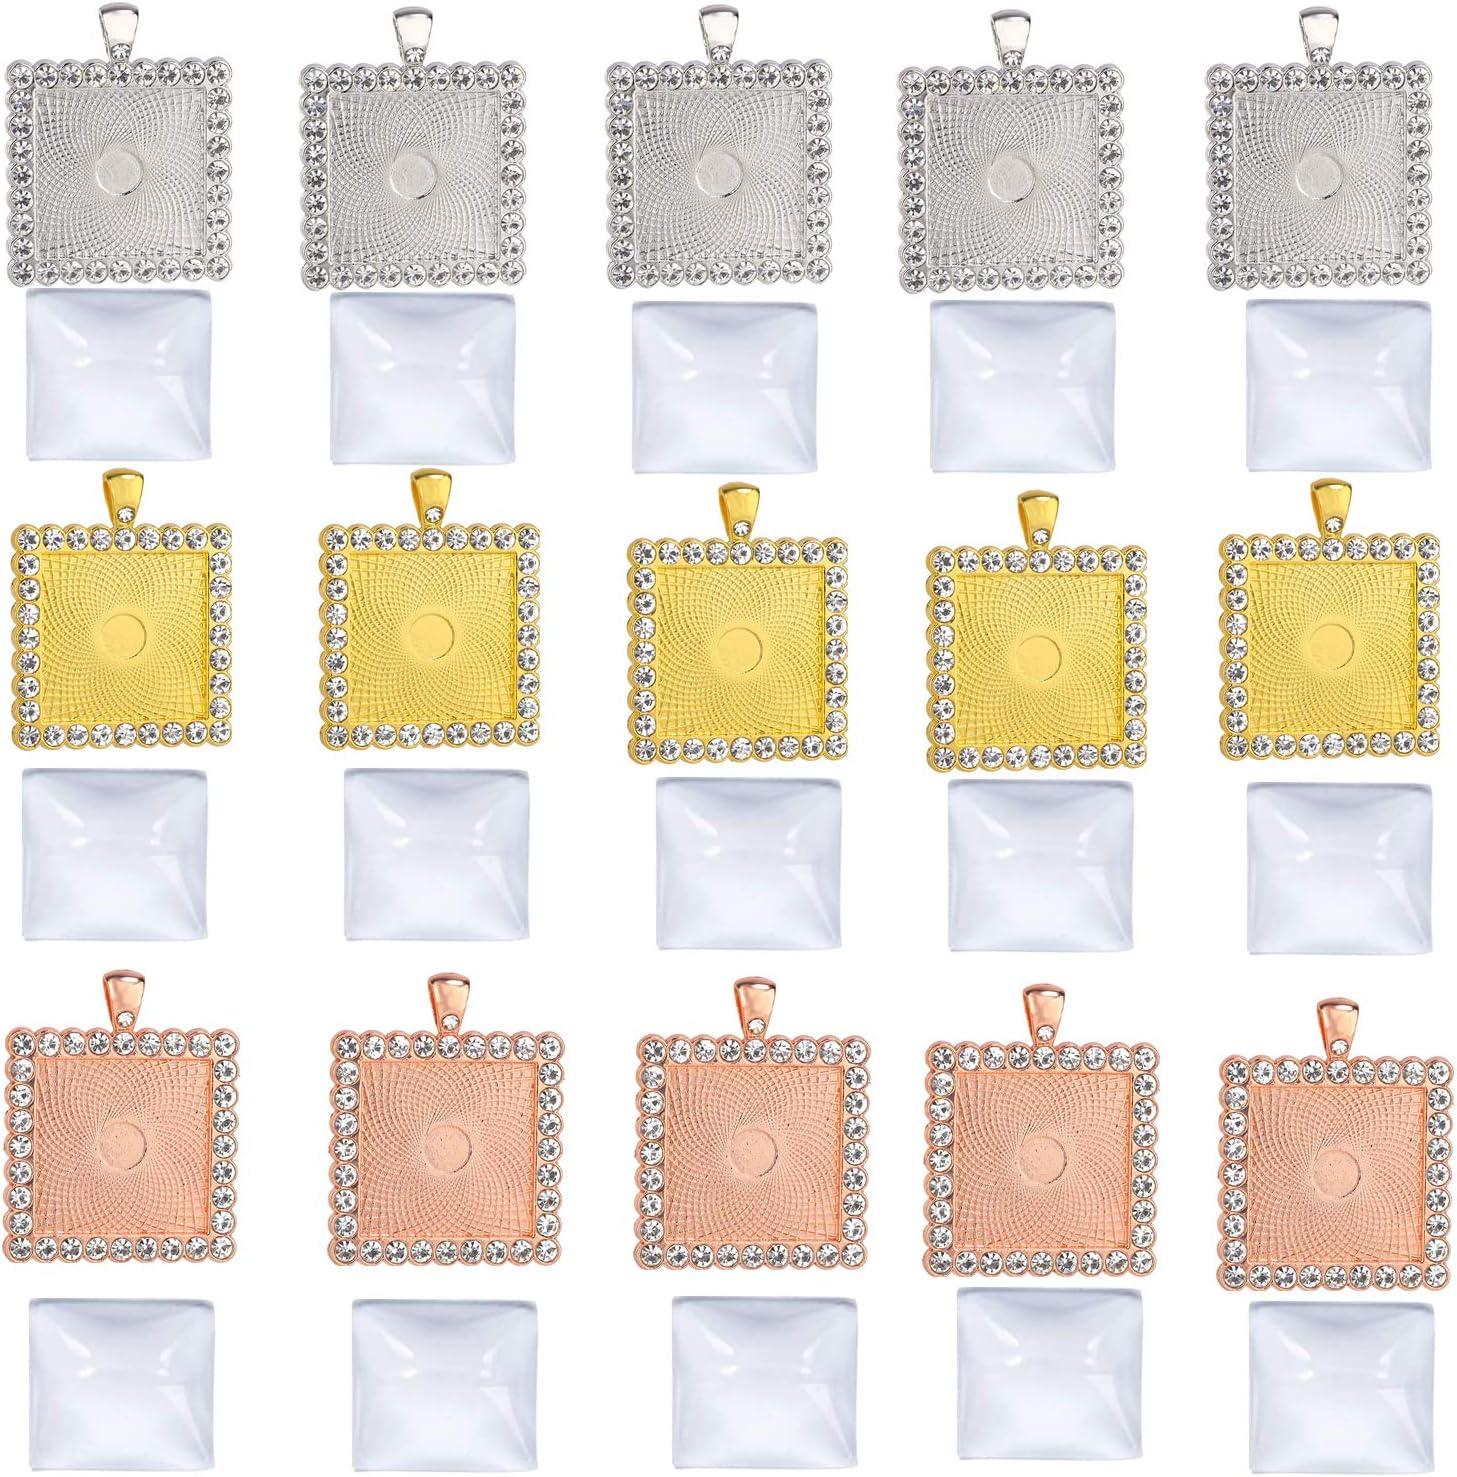 30 Pcs Rhinestone Bezel Pendant Trays Set,15 Pcs 3 Colors 25mm Square Bezel Pendant Trays Blank Bases with 15 Pcs Clear 25mm Square Glass Cabochons for Photo Pendant DIY Jewelry Craft Making